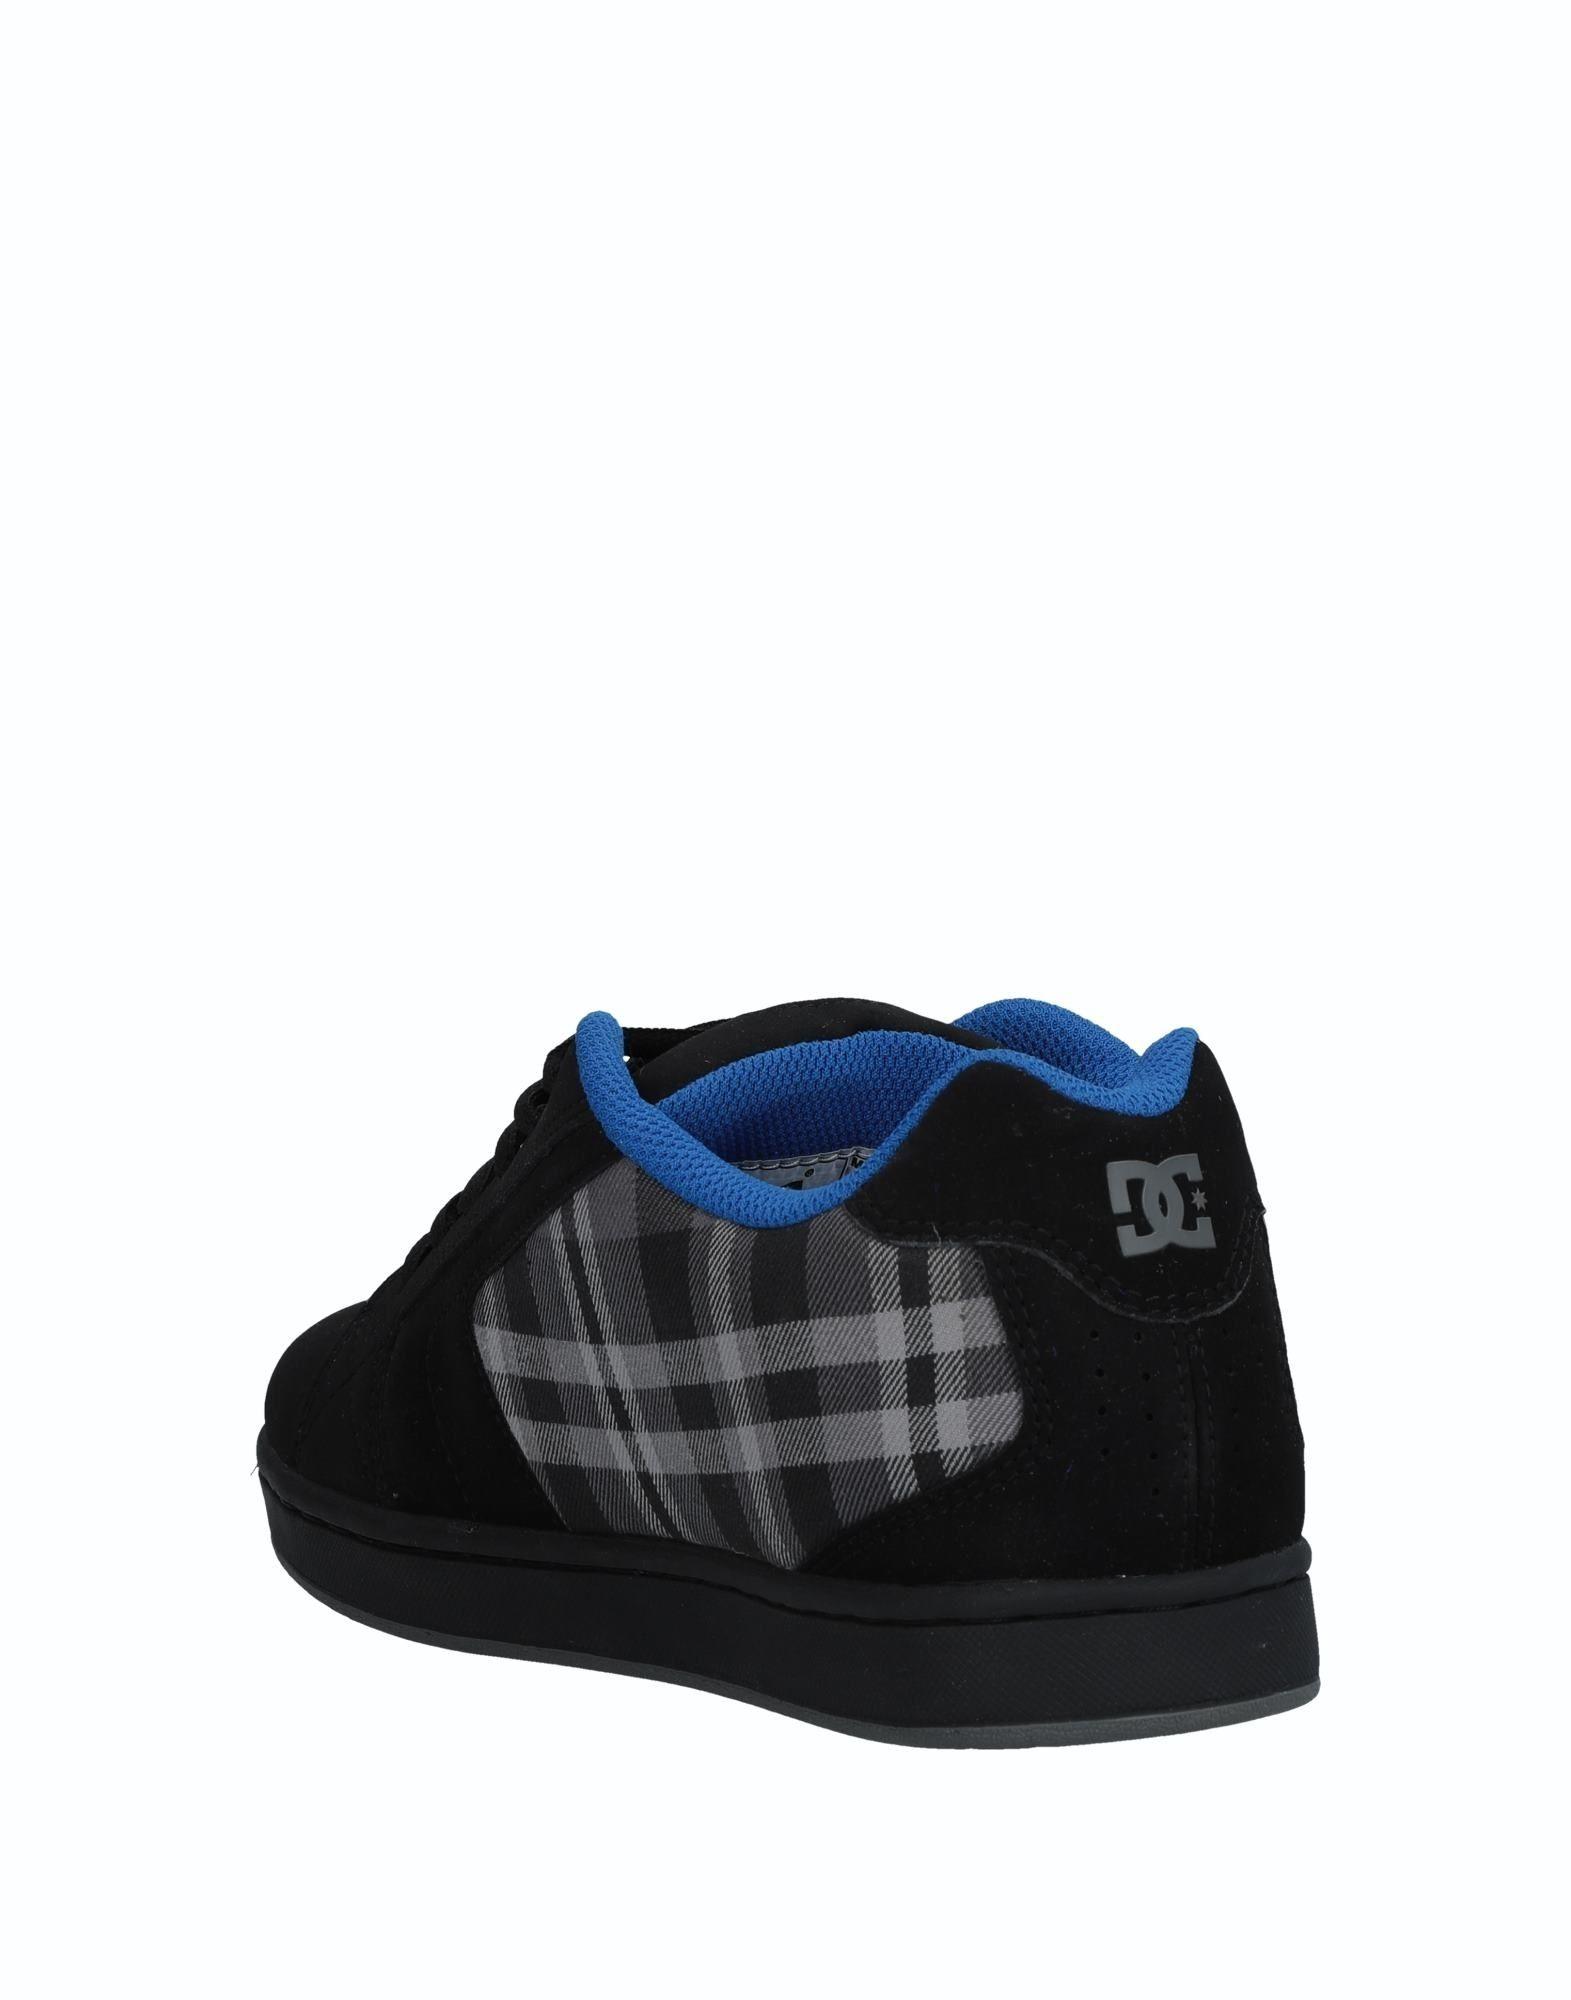 Sneakers Dc Shoecousa Uomo - 11523425RV 11523425RV - 6095d1